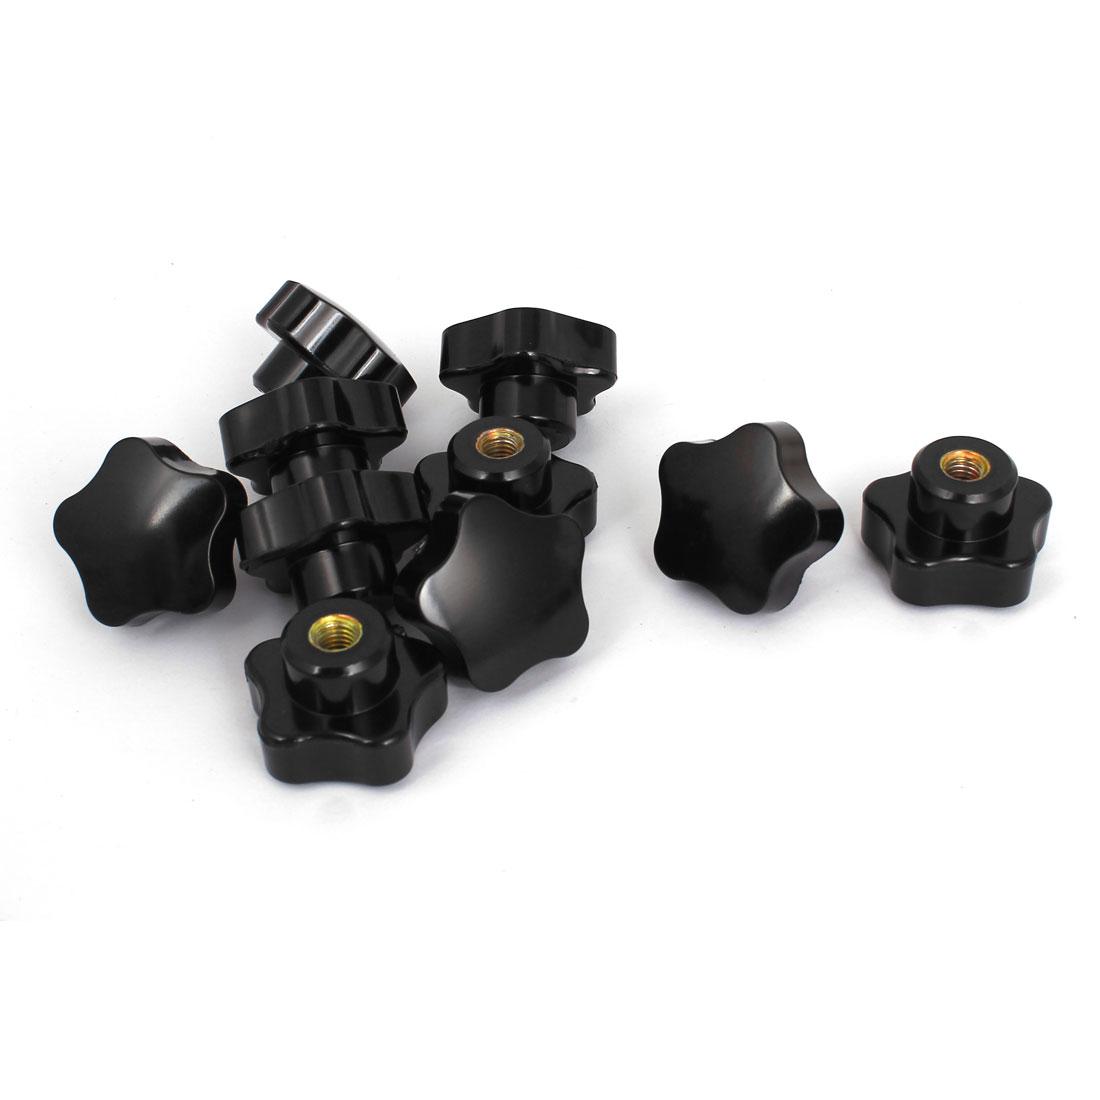 38mm Dia Star Head M8 Female Thread Nuts Clamping Knob Grip Black 10pcs